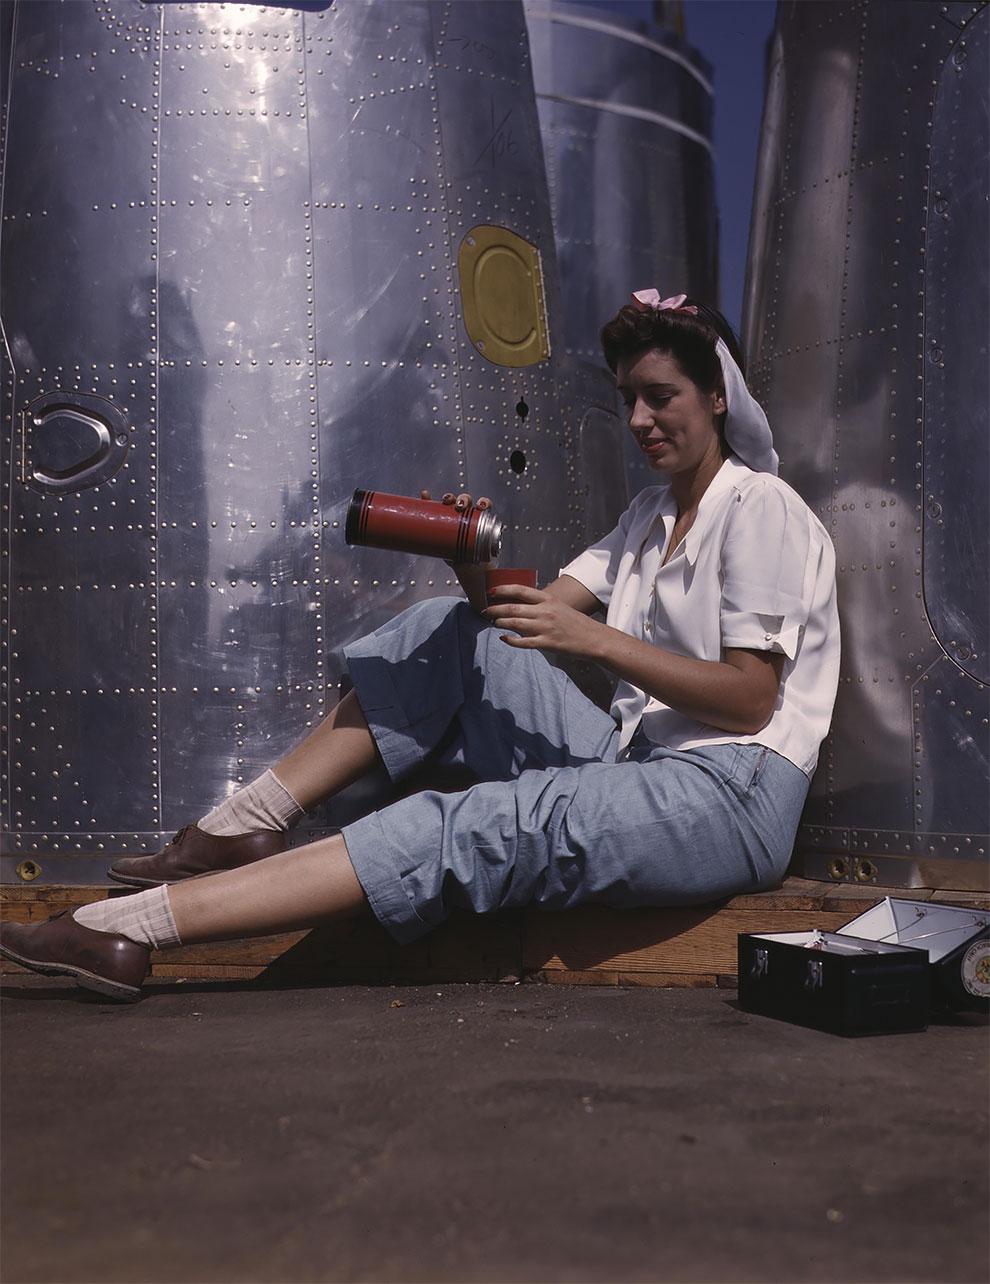 Девушка на обеде, Лонг-Бич, Калифорния, 1942 г.